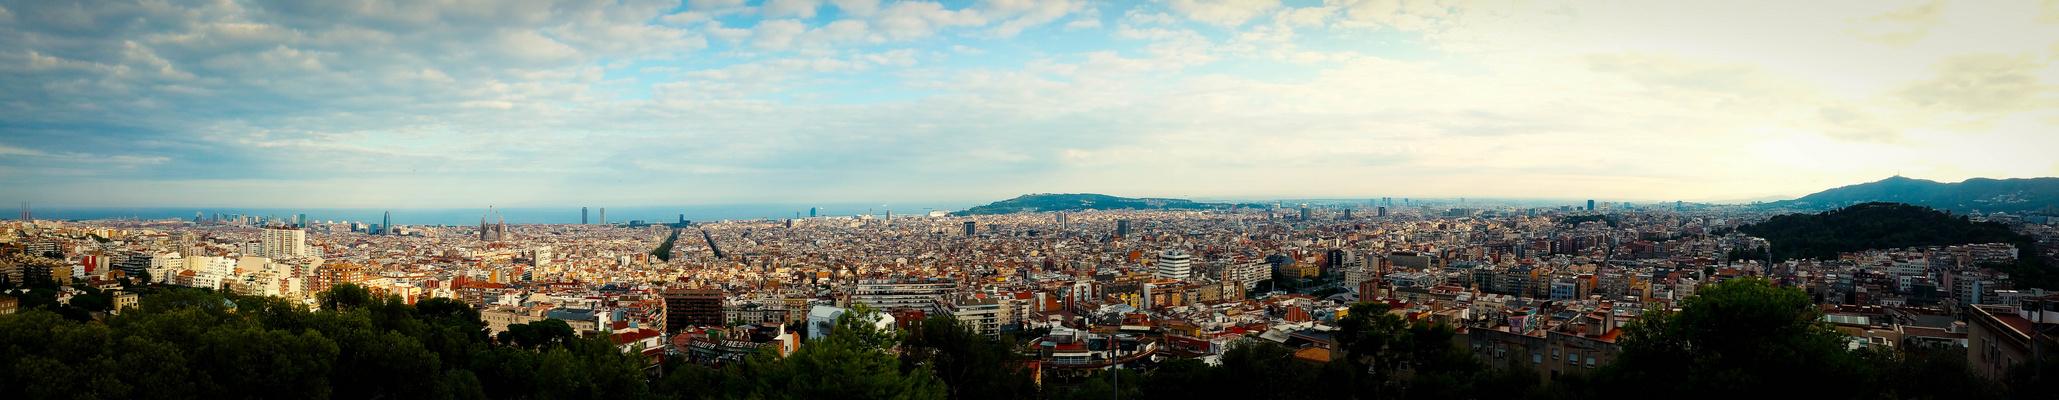 Best Panorama Barcelona